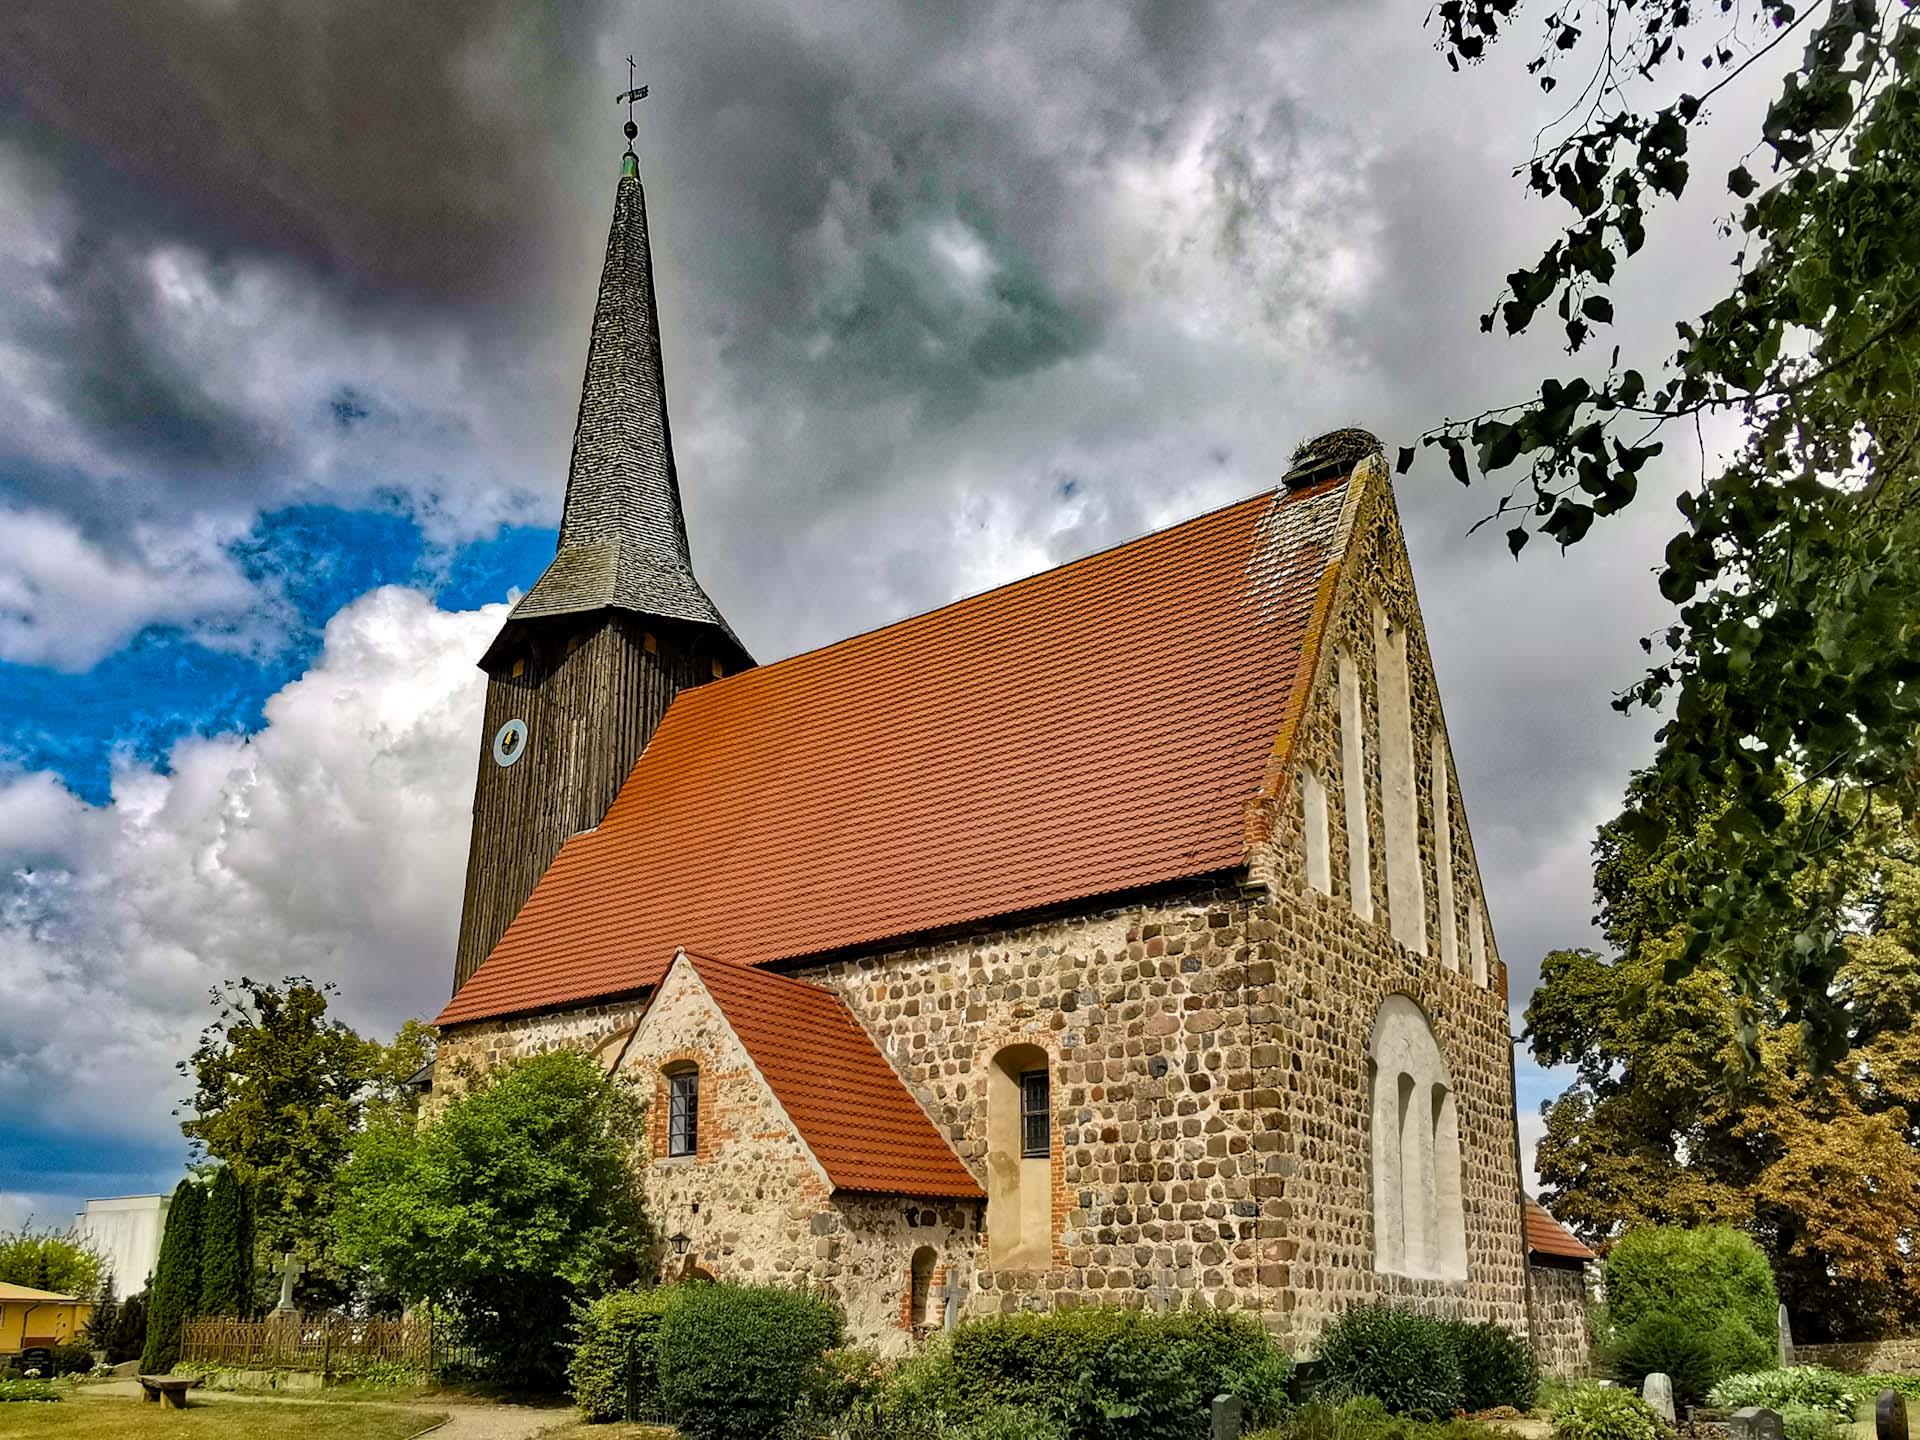 Dorfkirche Cölpin